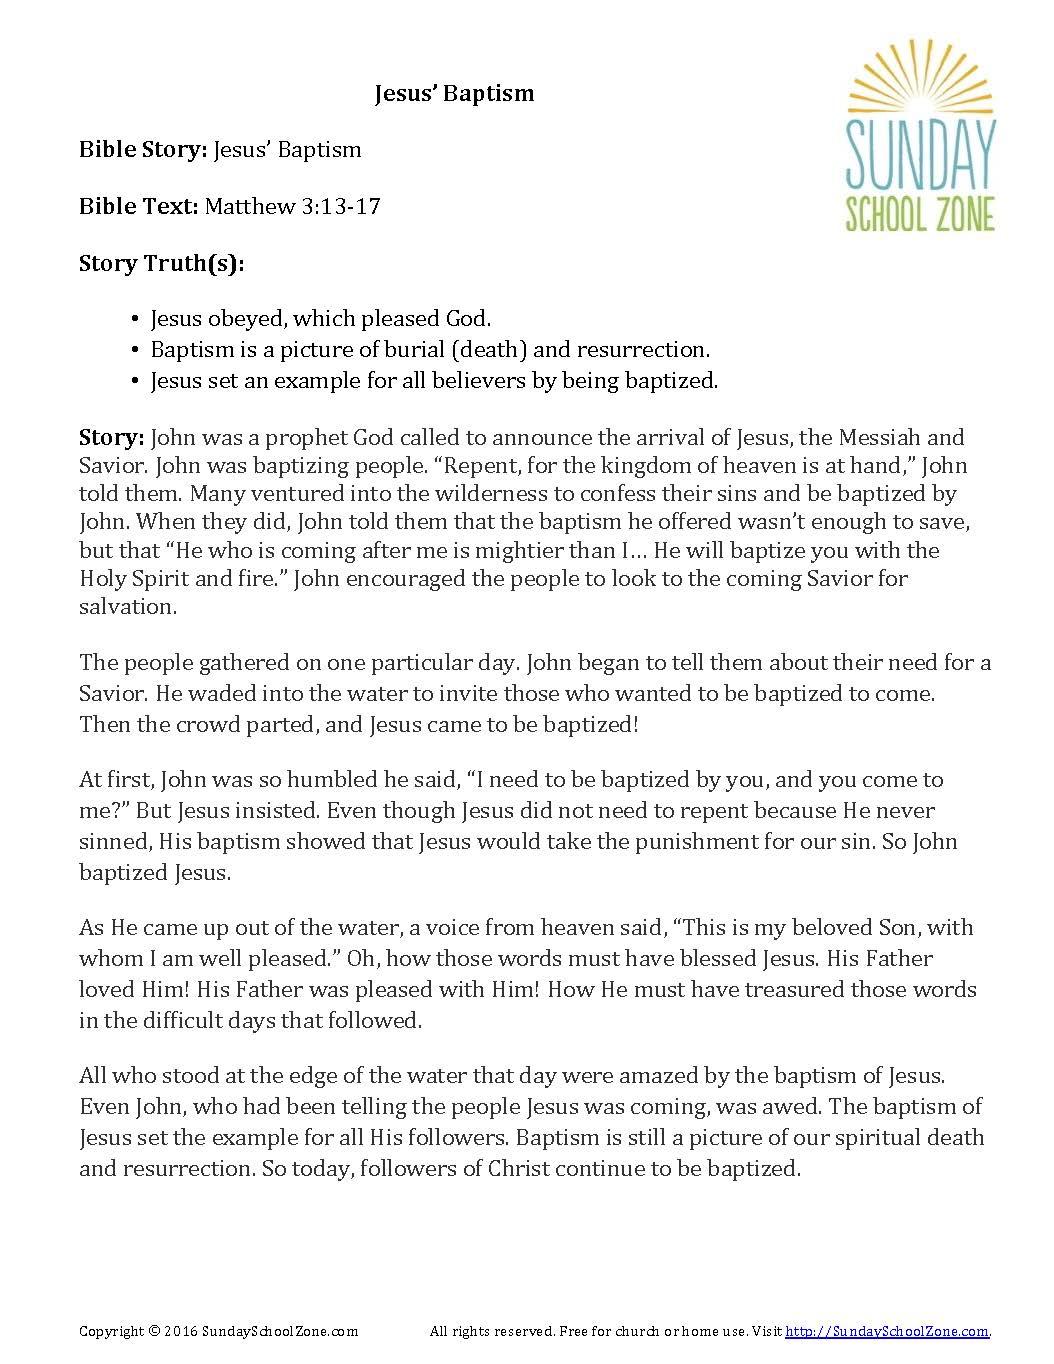 Jesus Baptism Story Summary